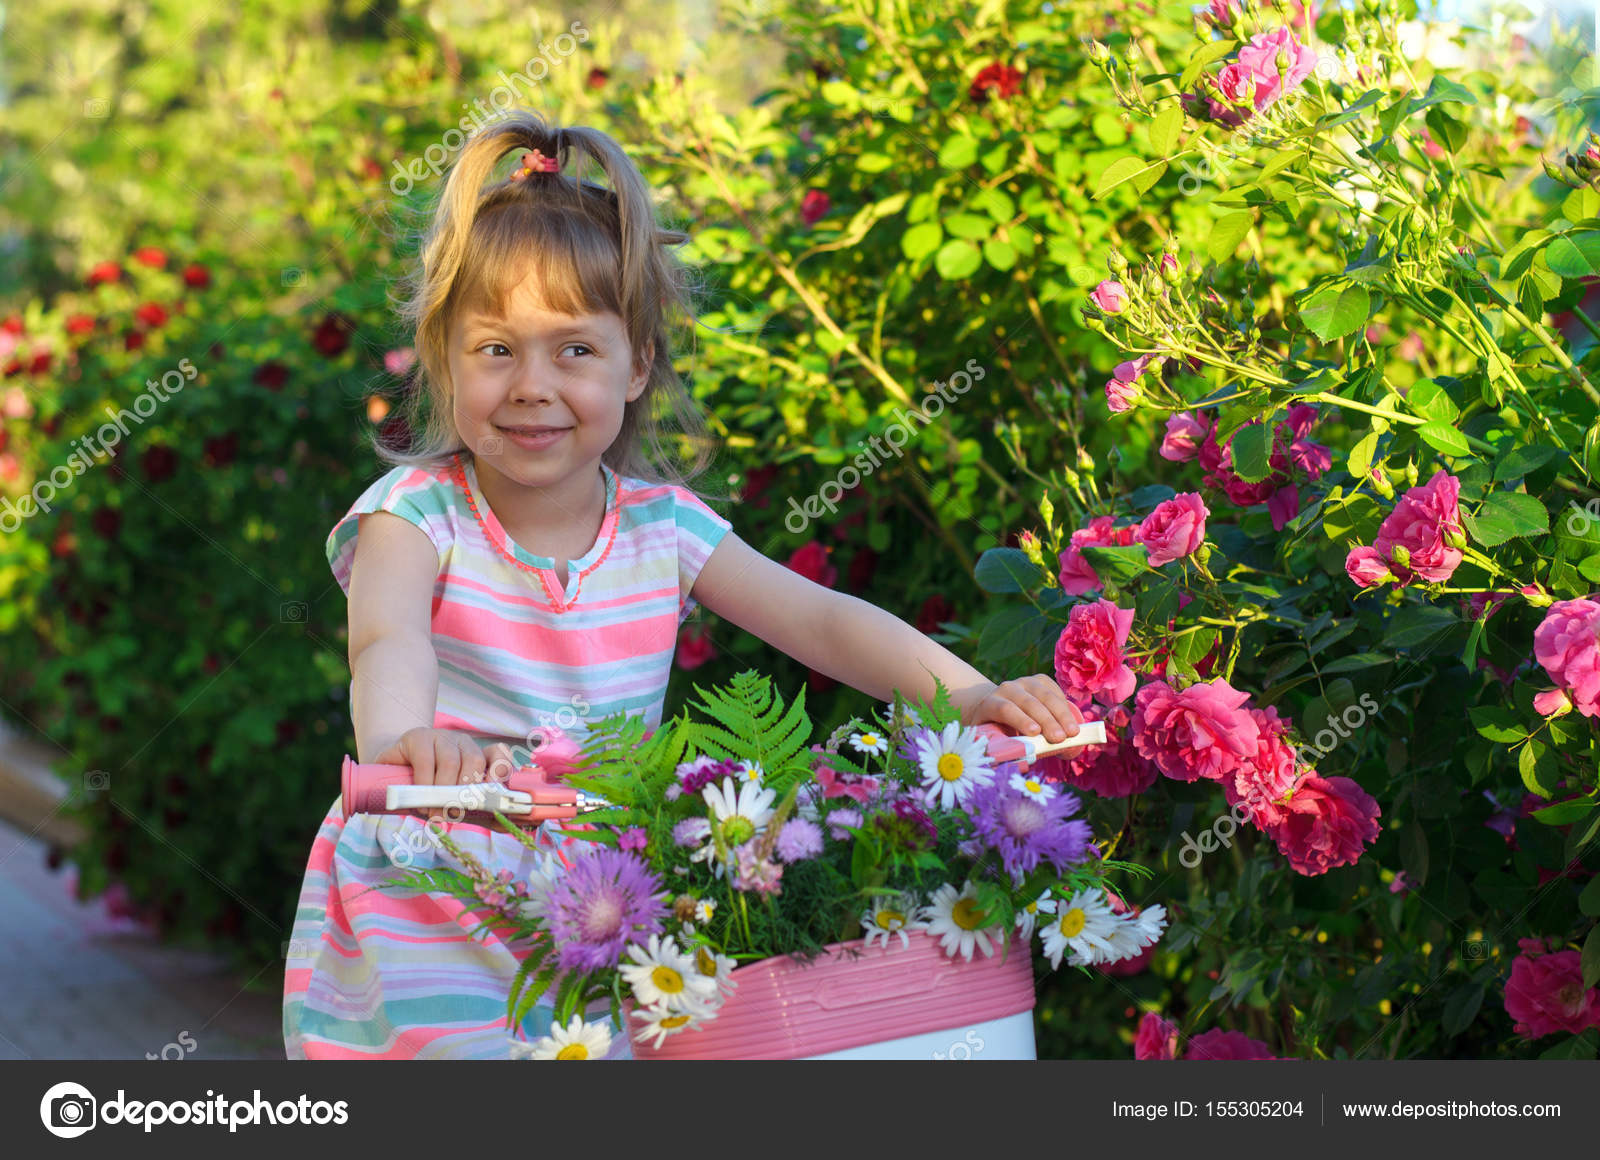 Feliz niña montando una bicicleta, Foto retrato — Foto de Stock